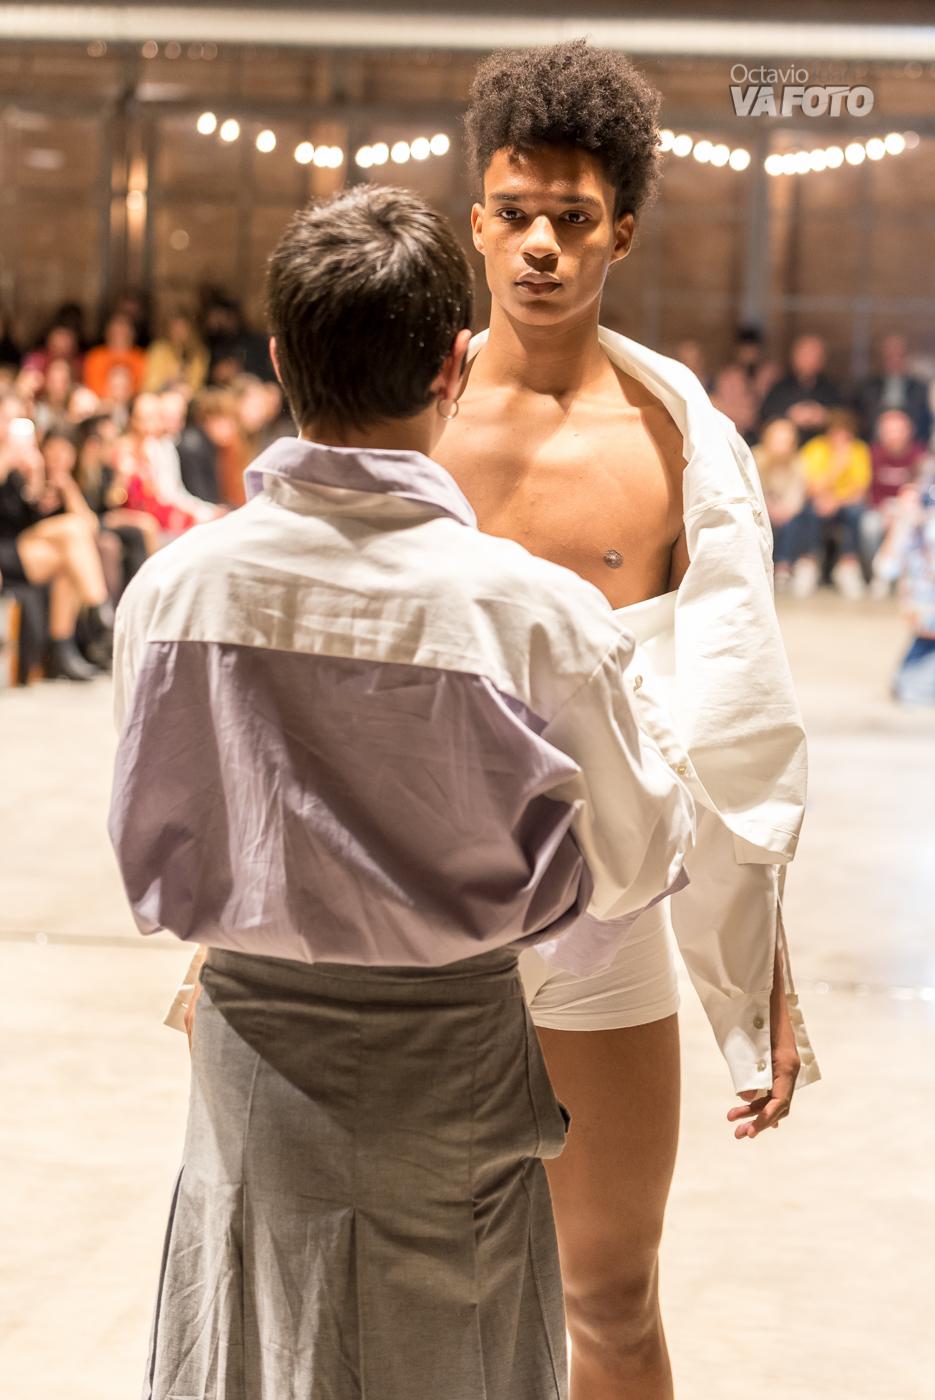 00257 ARTEMODA DSC4356 20181124 - Evento: Arte + Moda Valencia